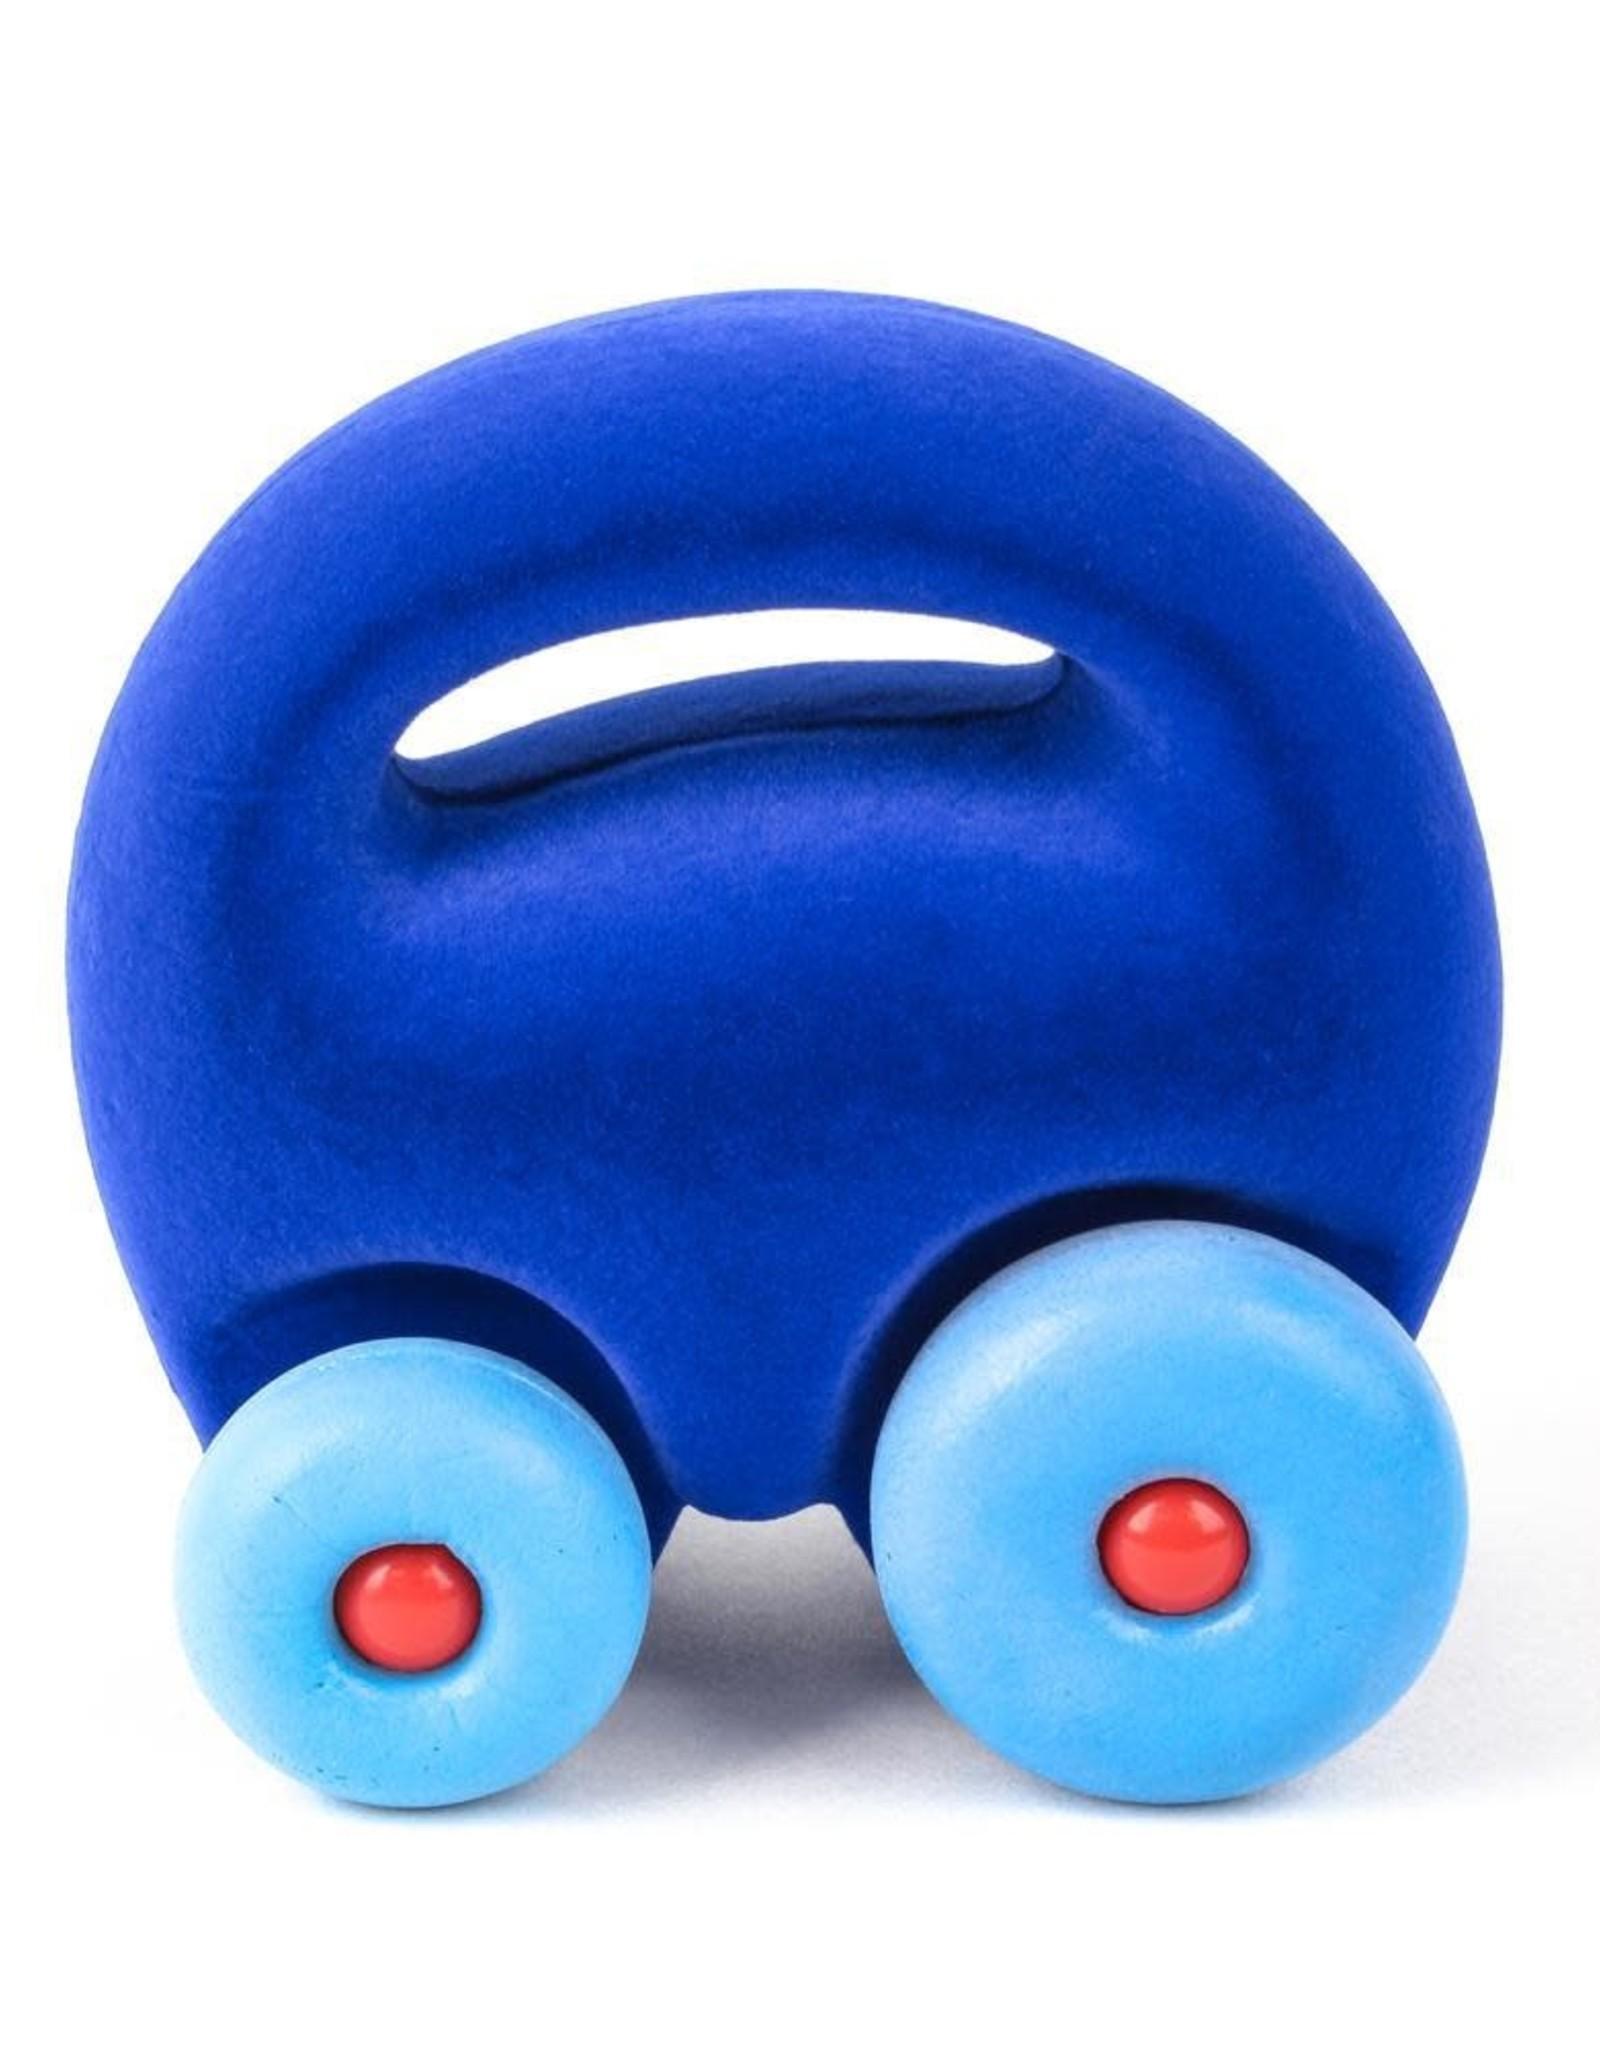 Rubbabu The Mascot Car Grab'em, Blue